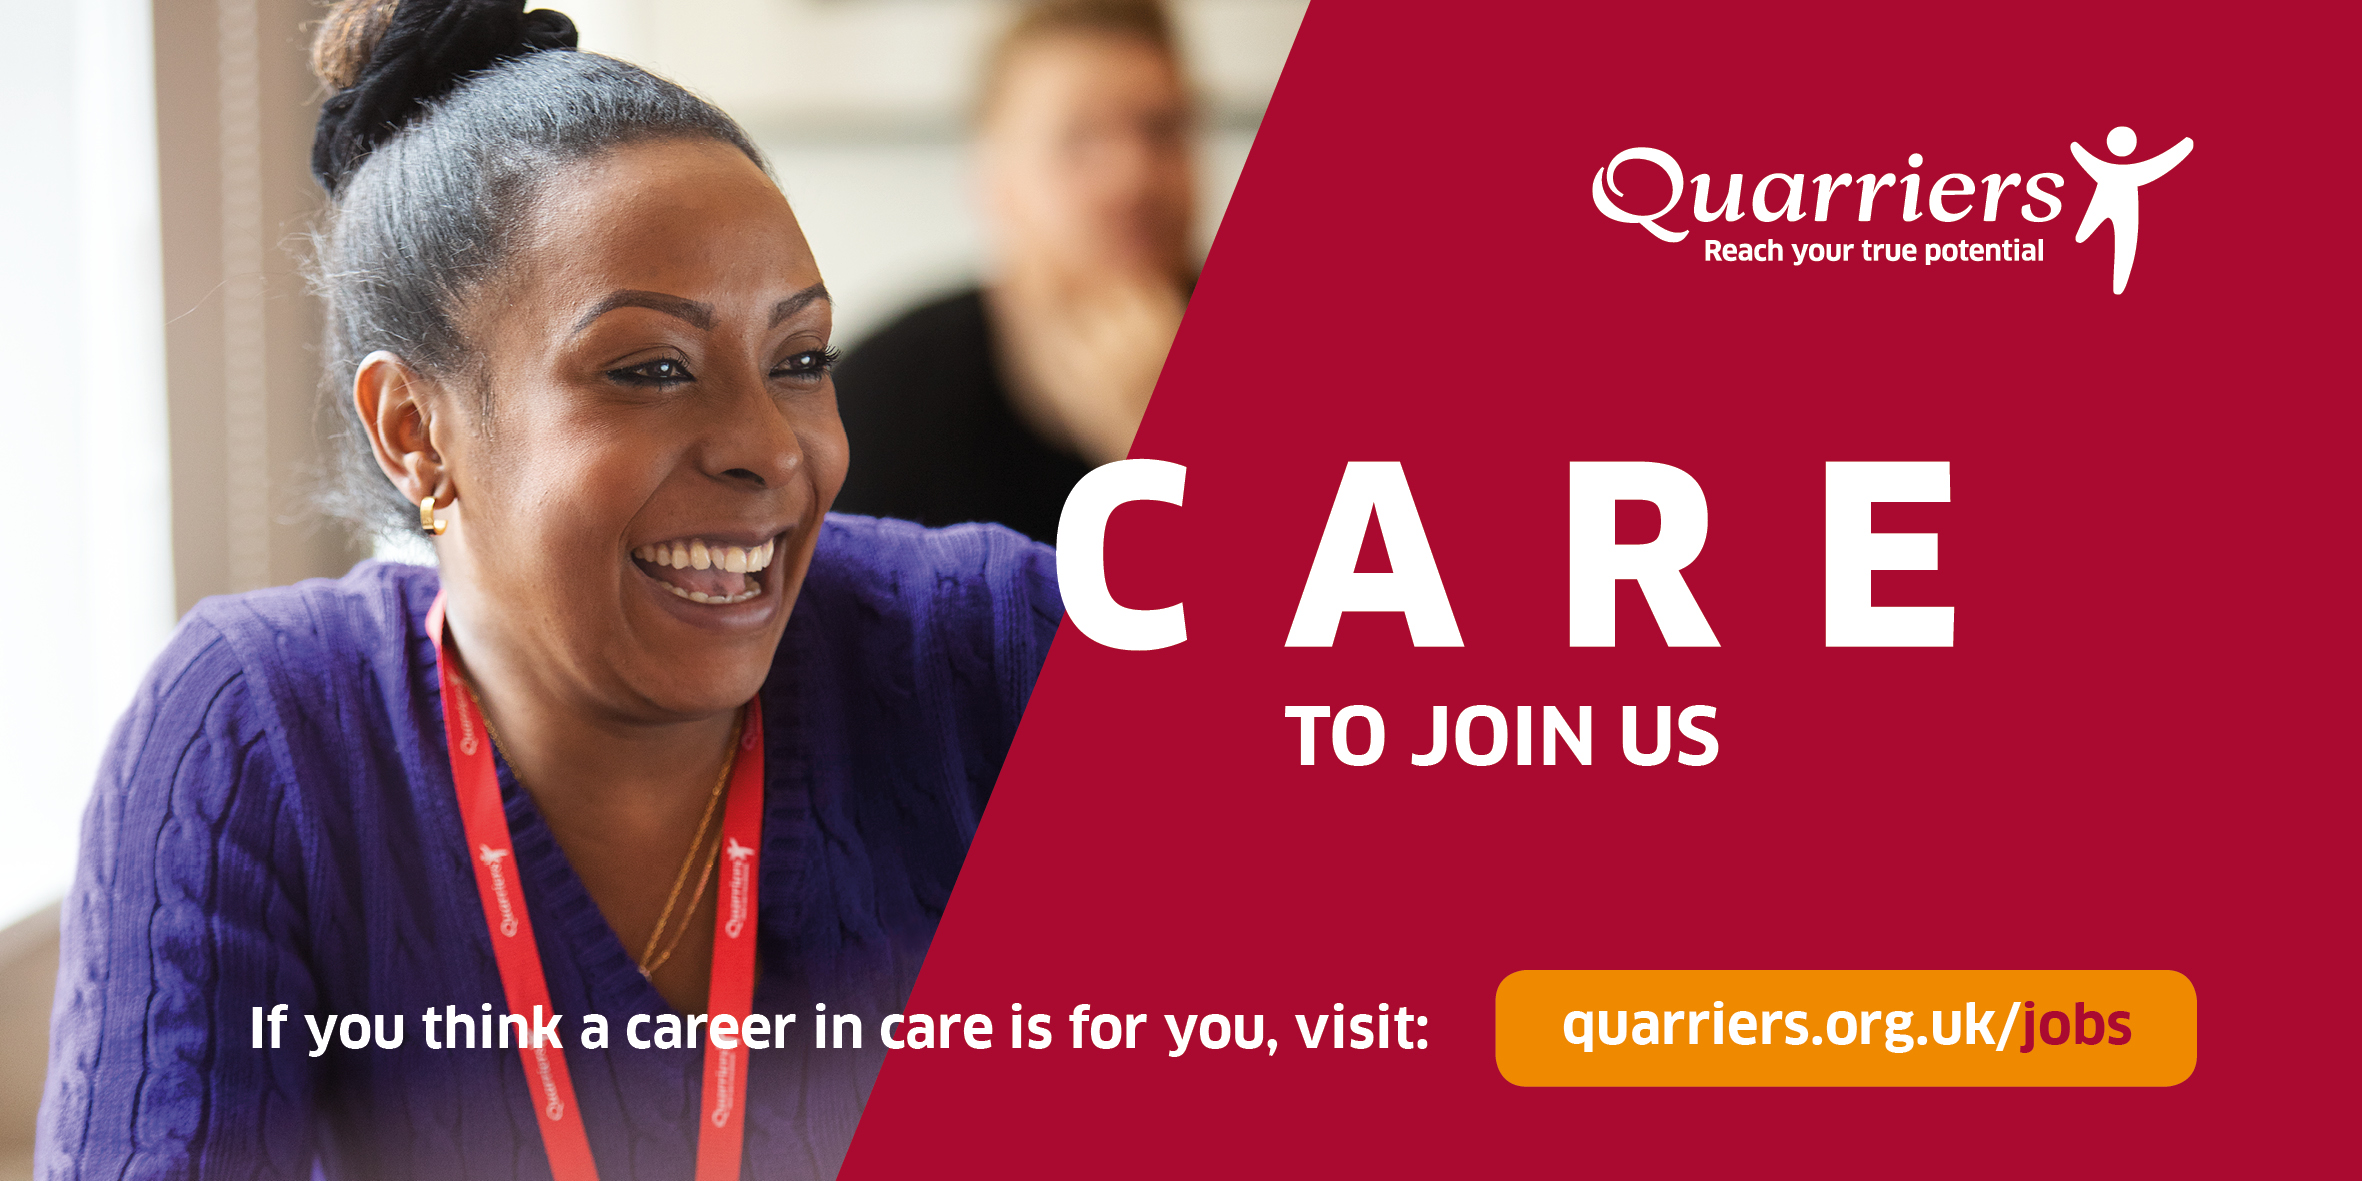 Quarriers Recruitment Advertising Campaign Maguires